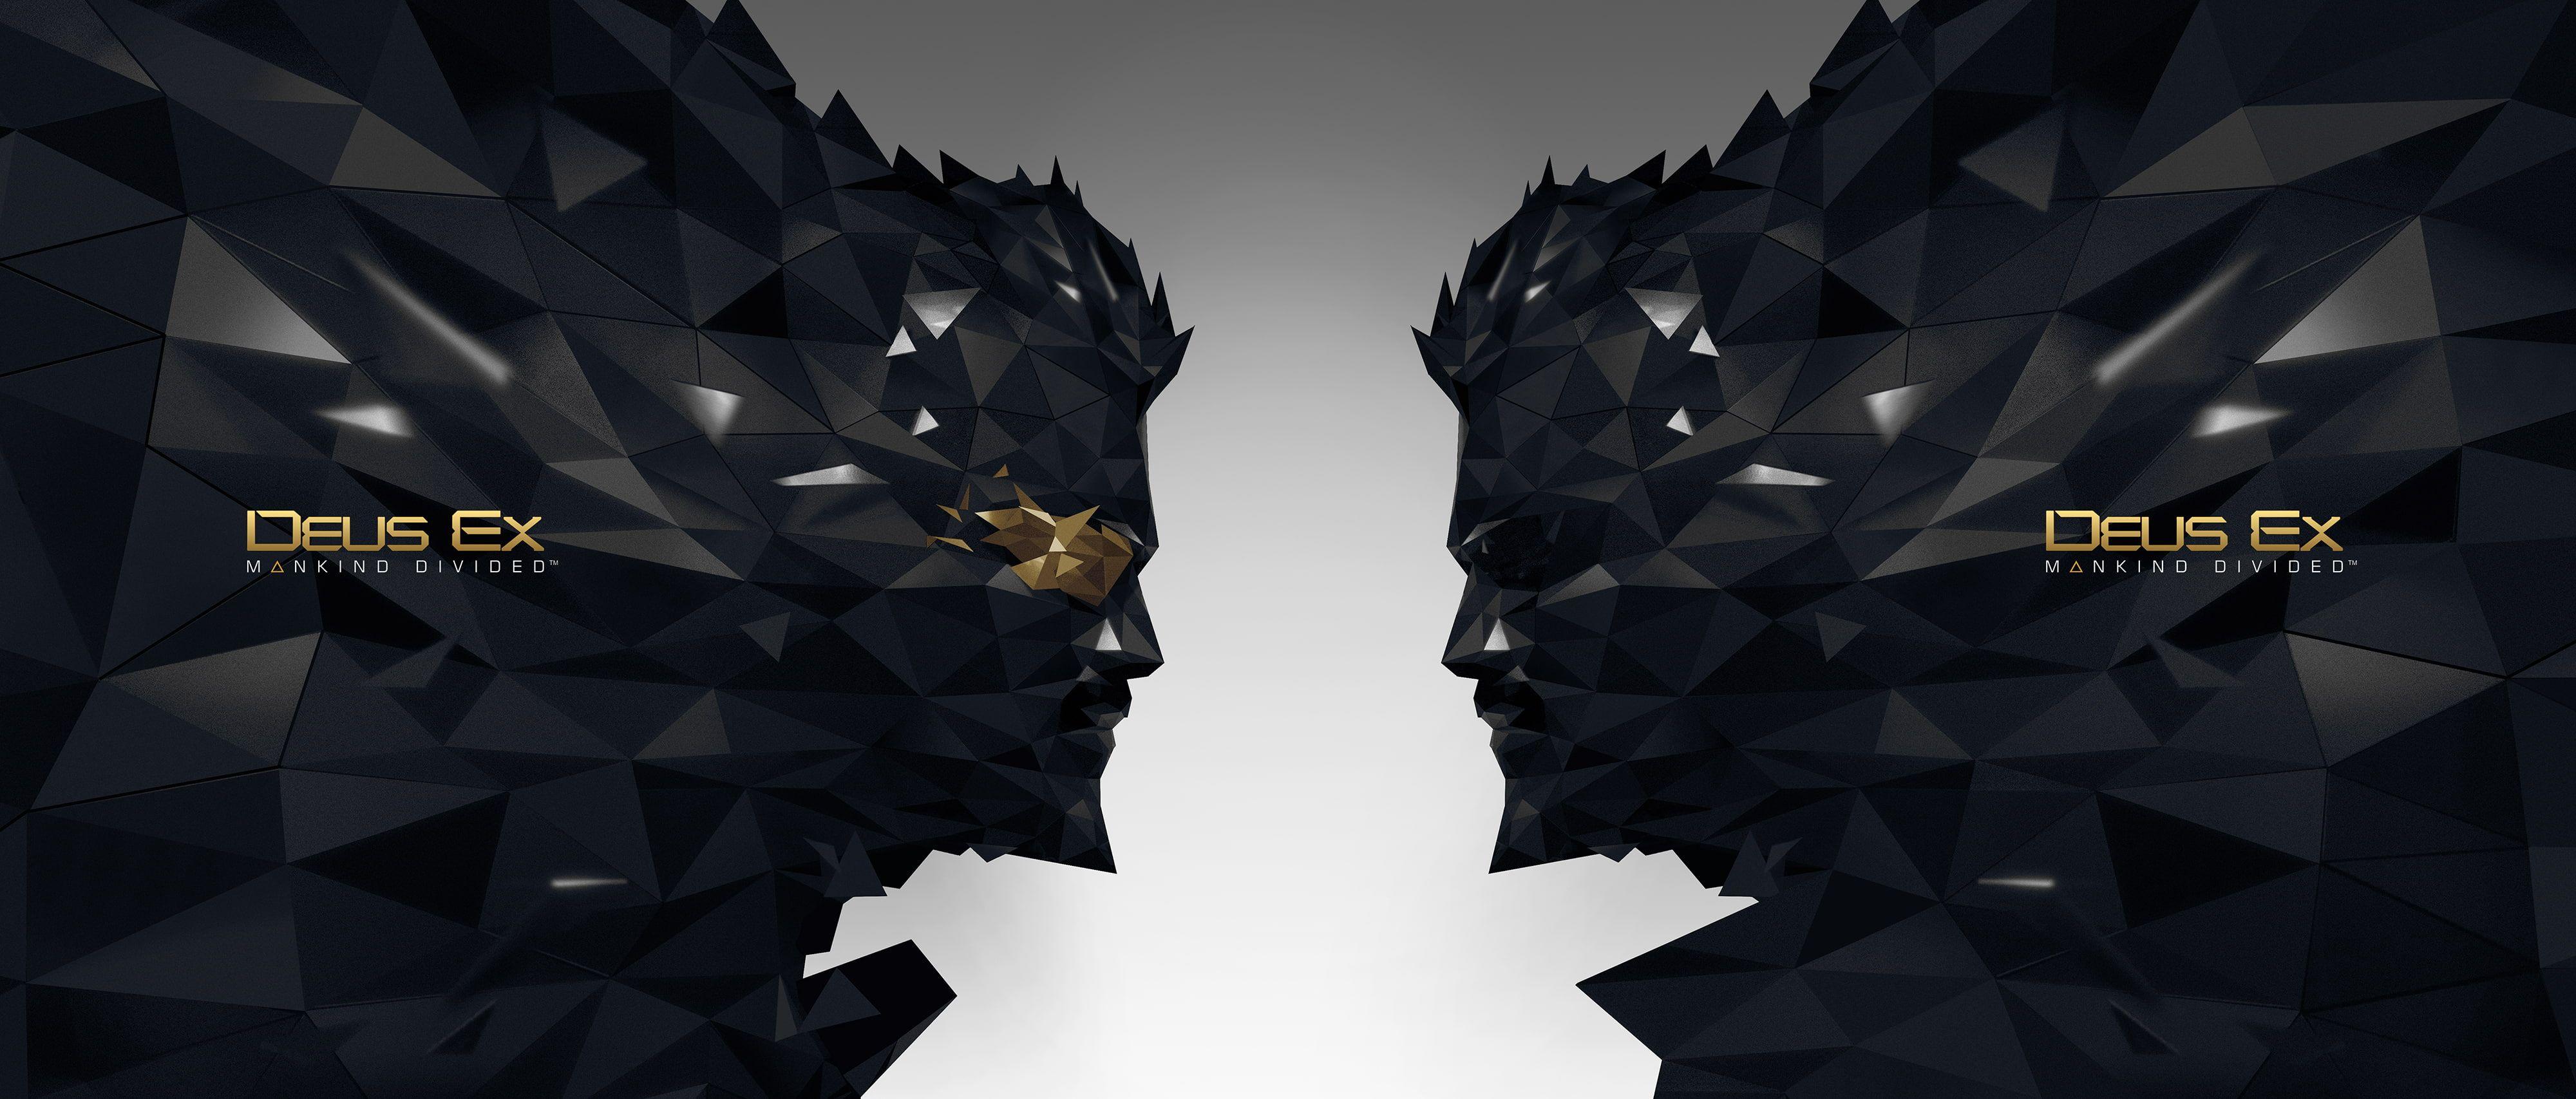 Deus Ex Mankind Divided Digital Deluxe Edition 4k 4k Wallpaper